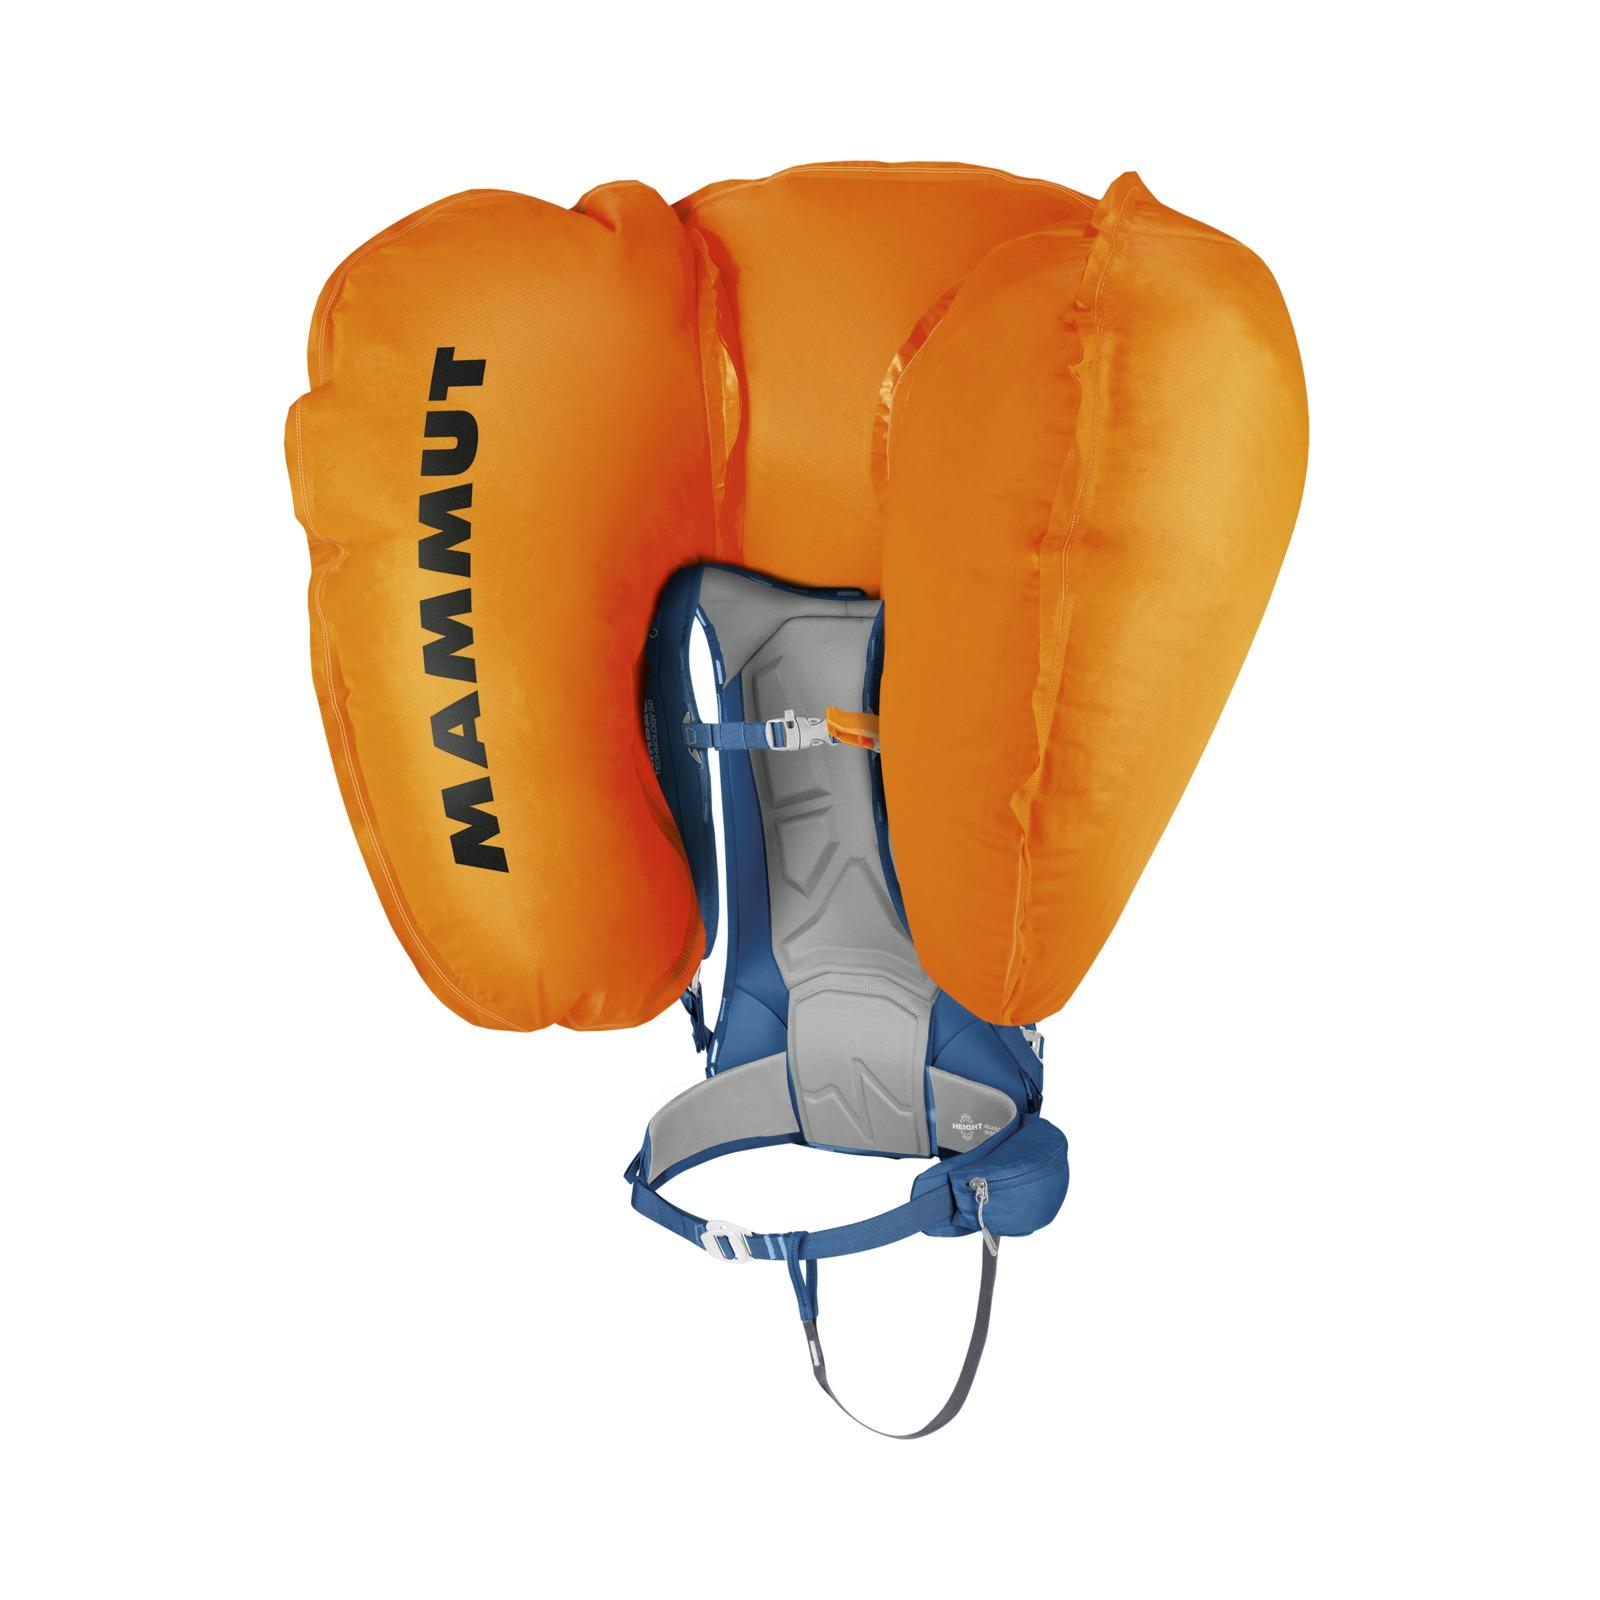 light-protection-airbag-3-0_darkcyan.jpg